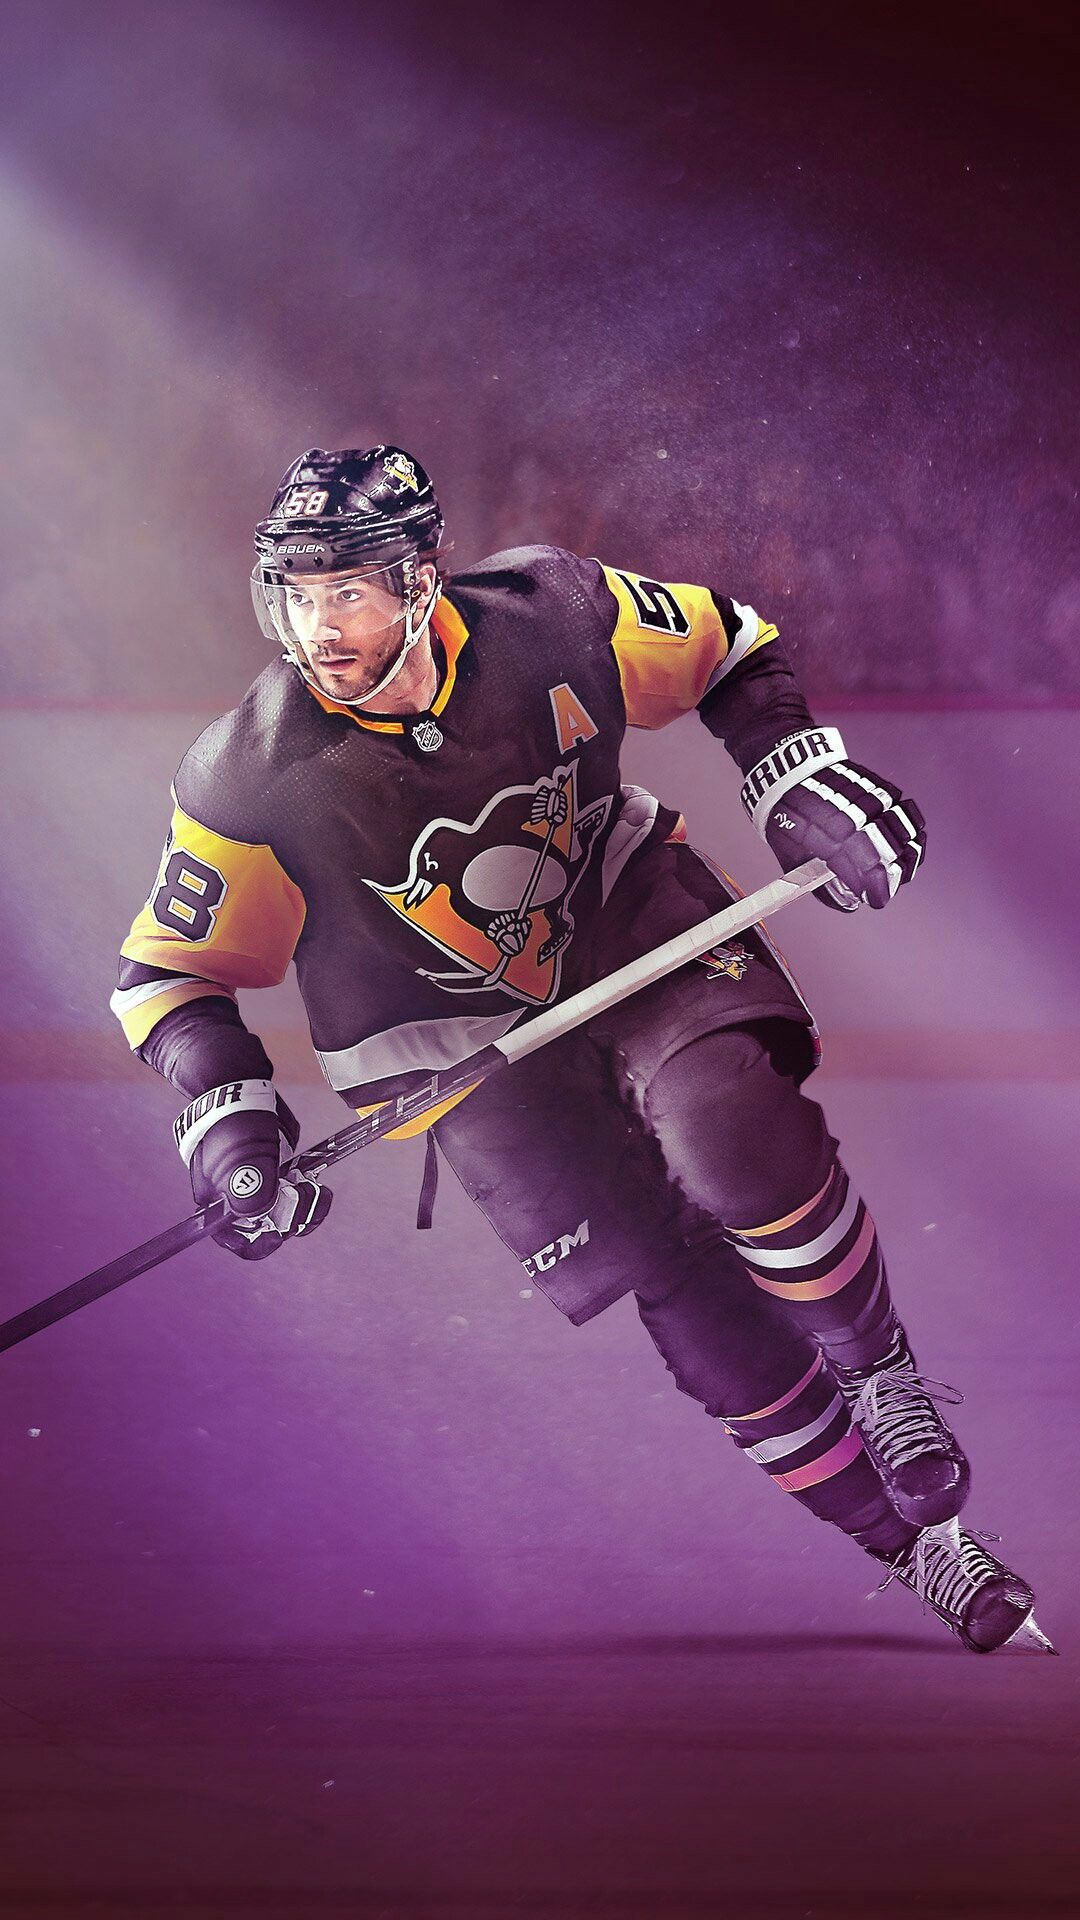 Letang Nhl Wallpaper Hot Hockey Players Pens Hockey